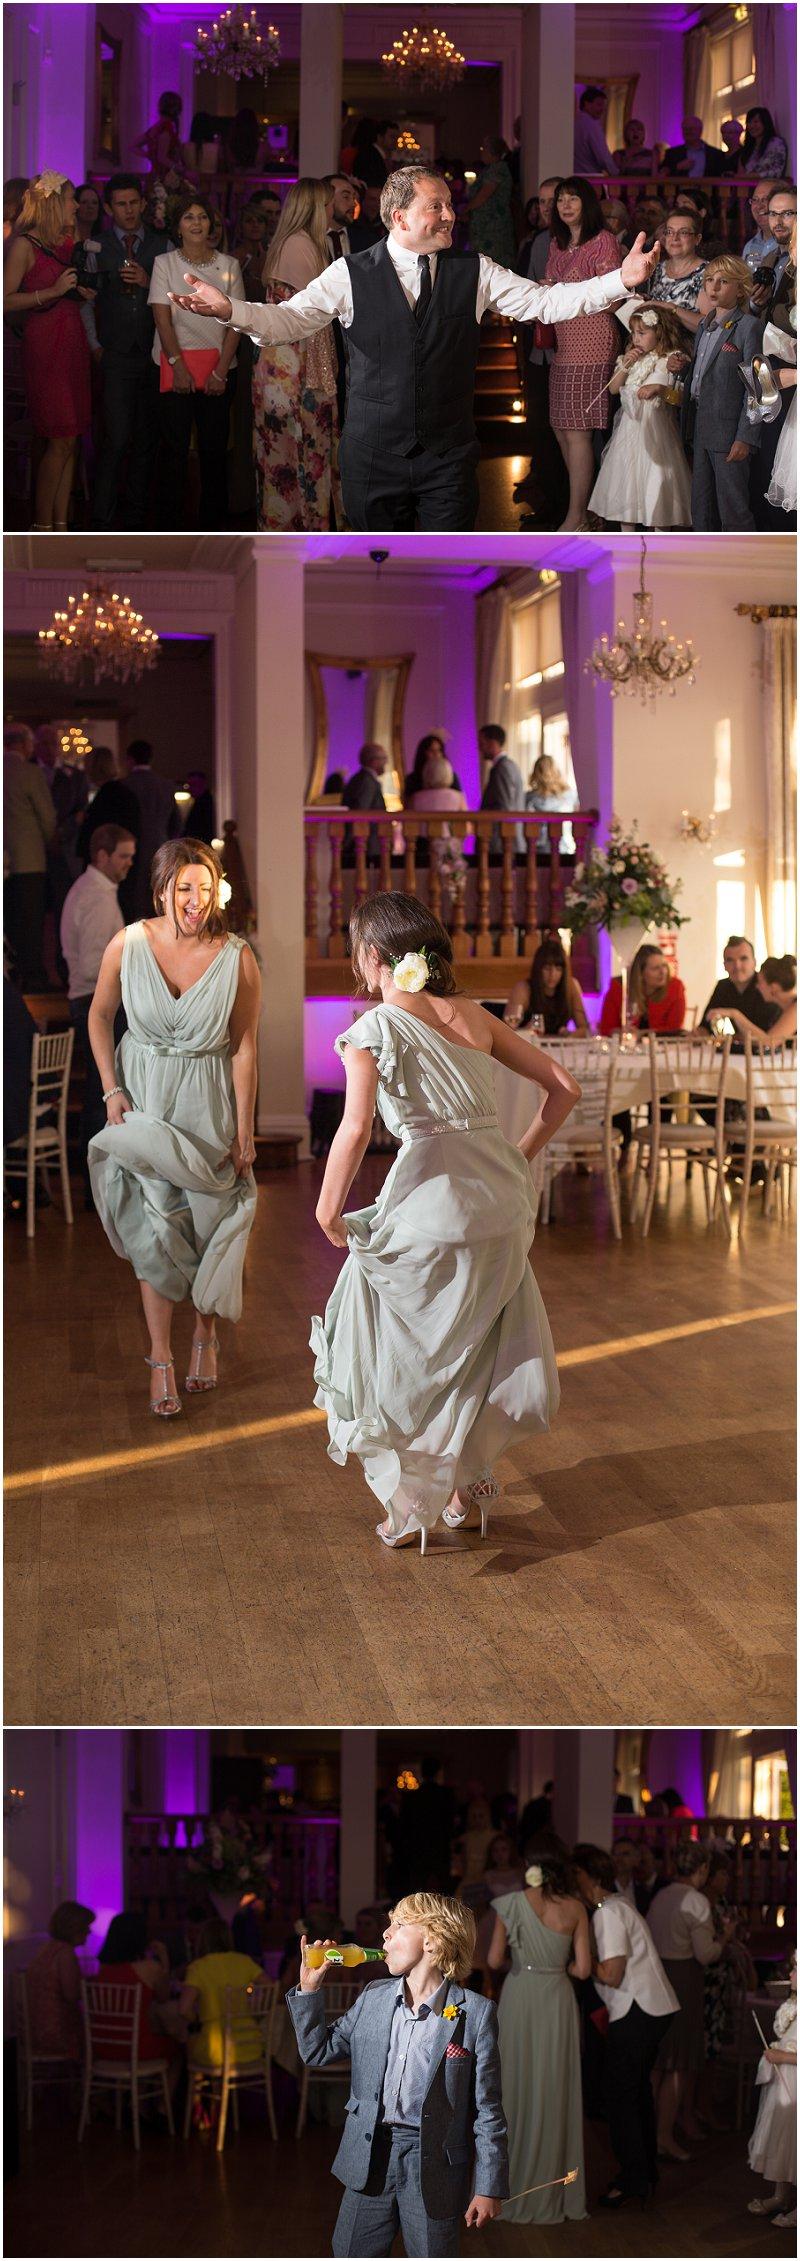 Evening dancing at West Tower Wedding Venue   Lancashire Wedding Photography